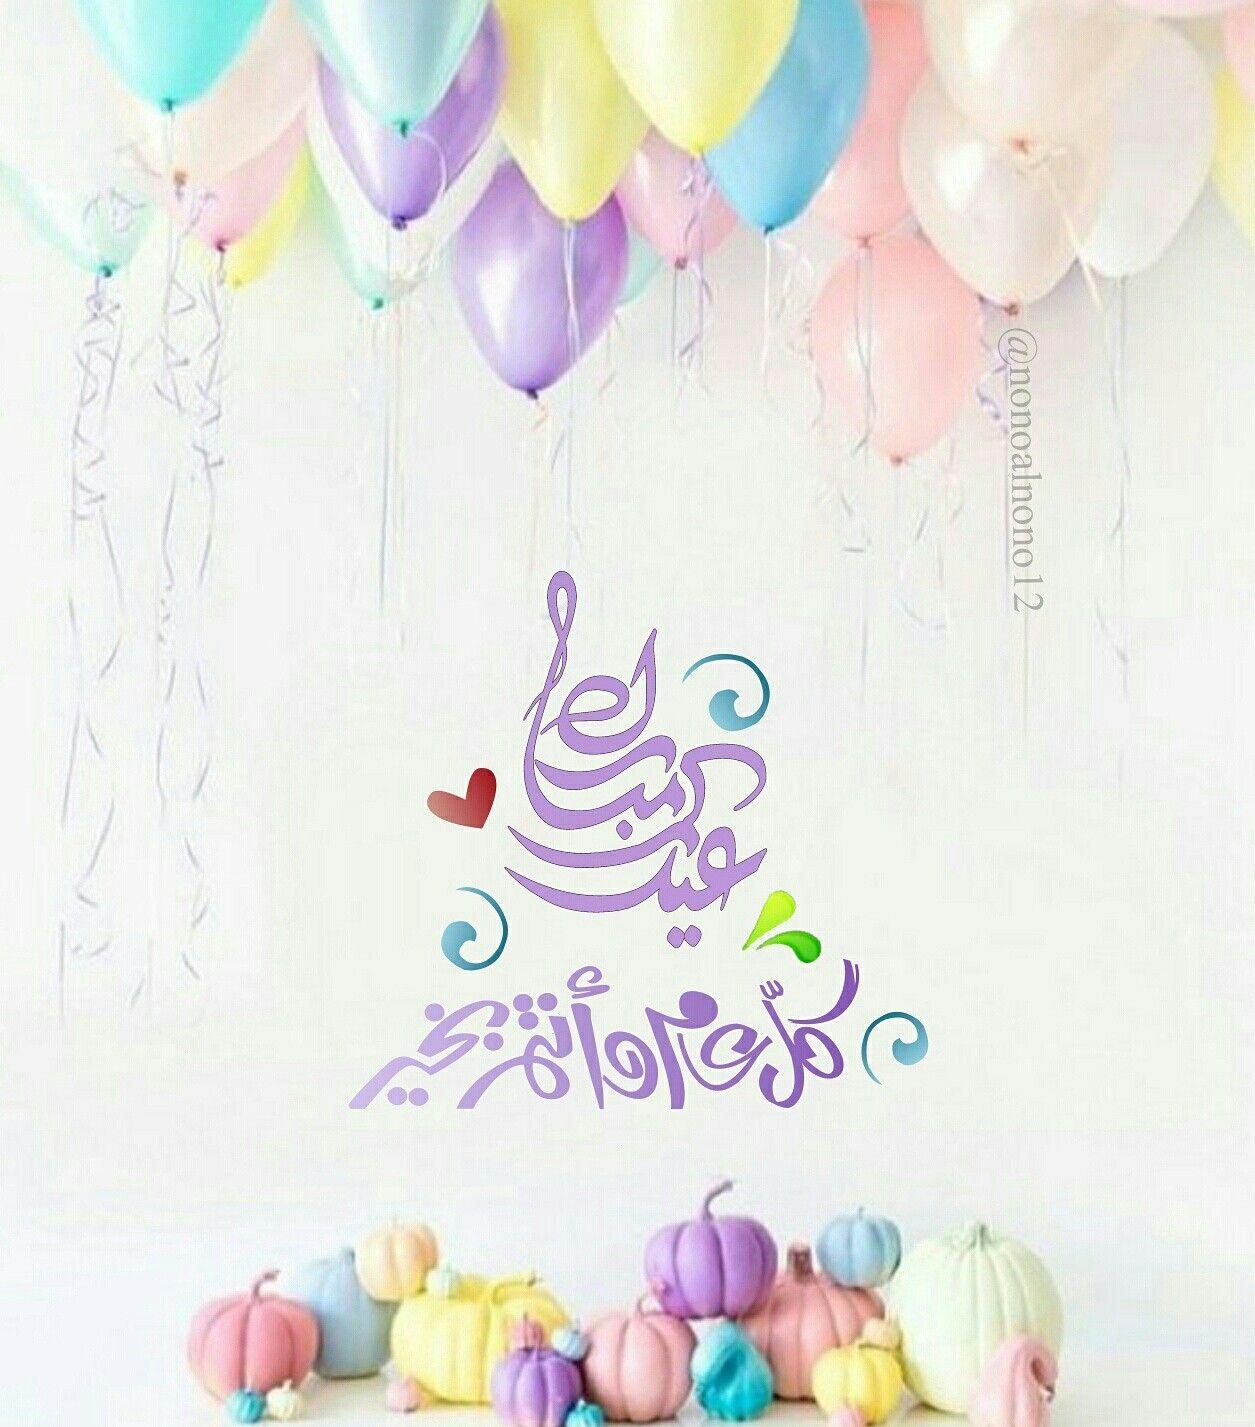 عيدكم مبارك Eid Stickers Eid Greetings Eid Cards